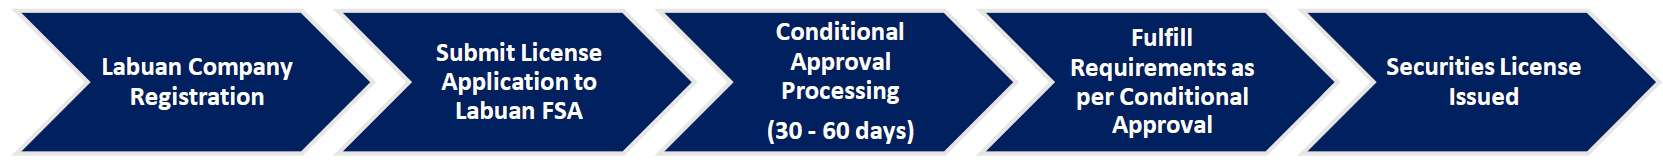 Process flow for Obtaining A Labuan Securities Licence   QX Trust - Offshore Labuan